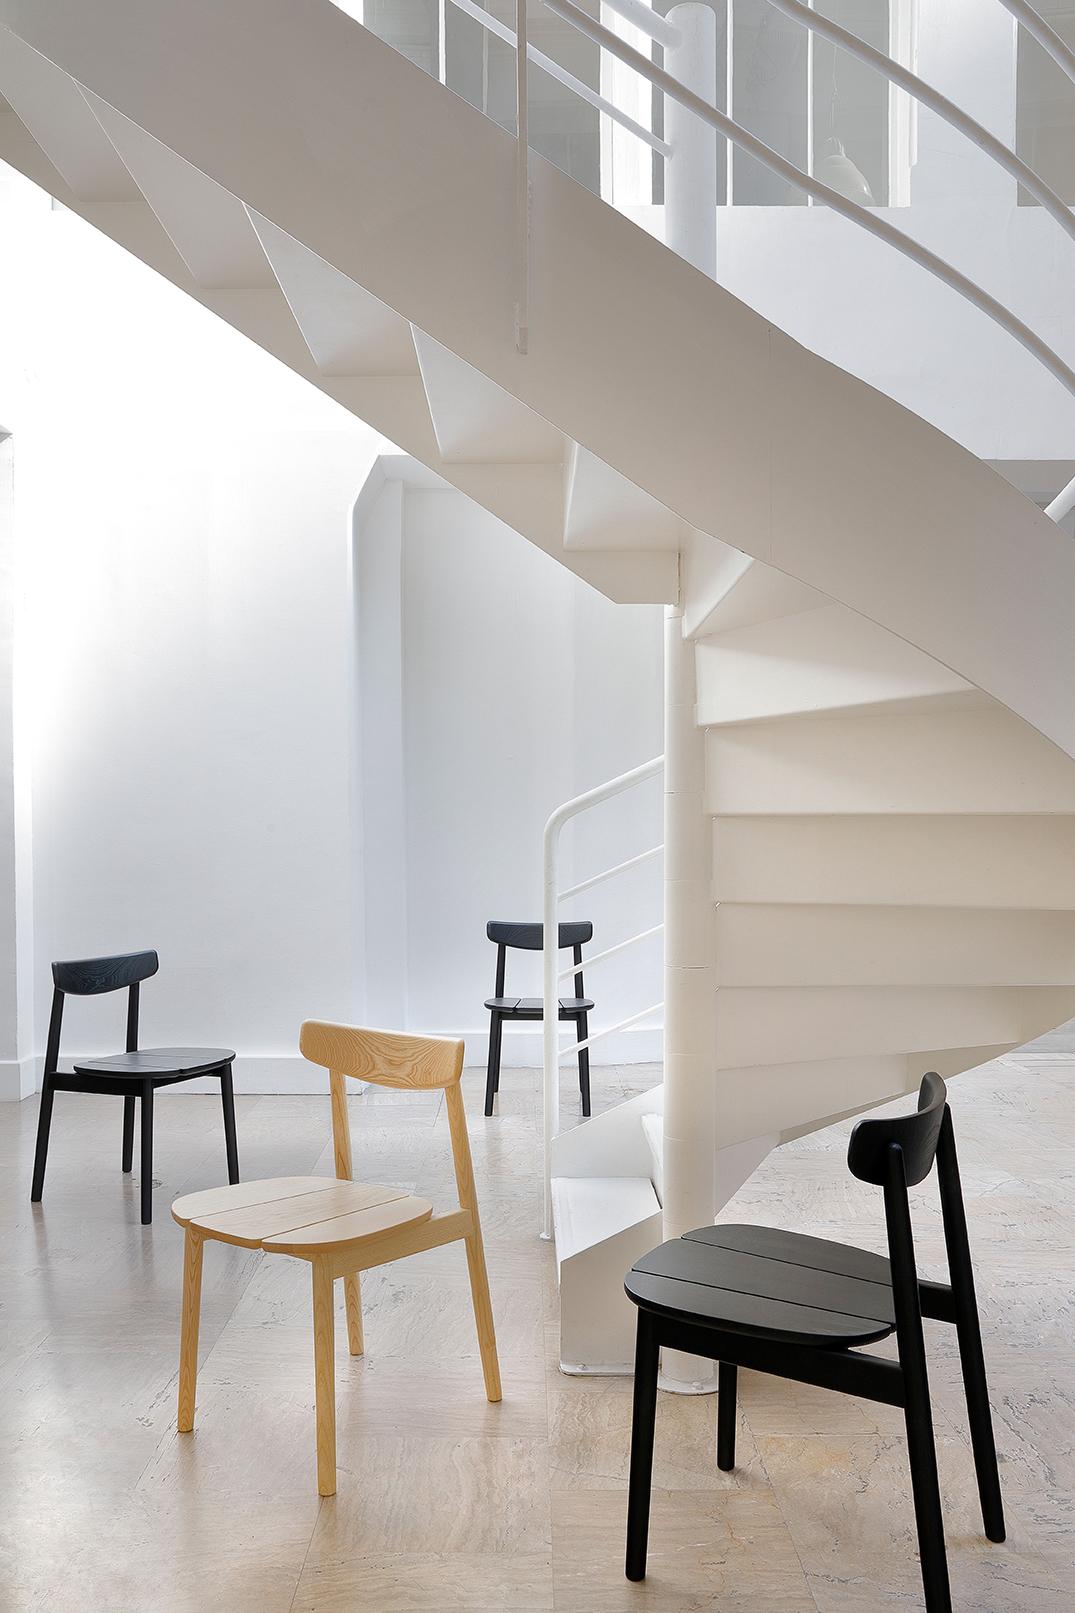 Klee Chair